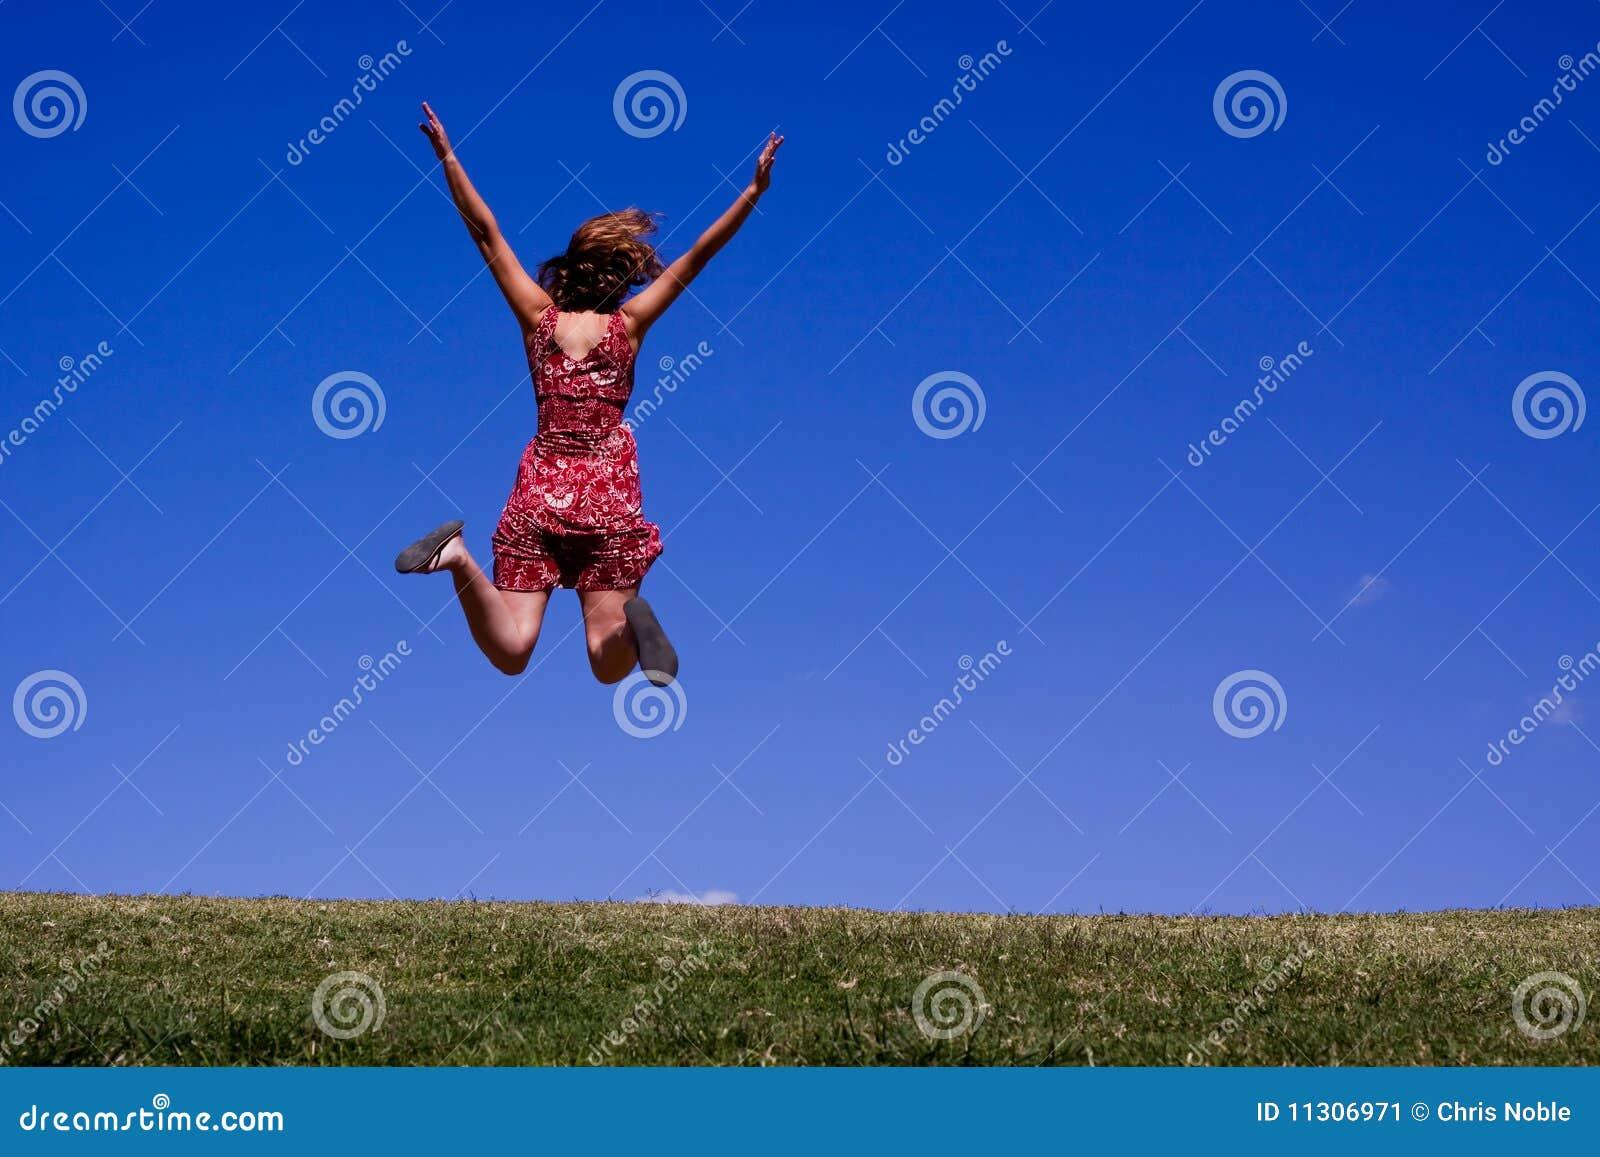 Junge Frau, die für Freude springt!